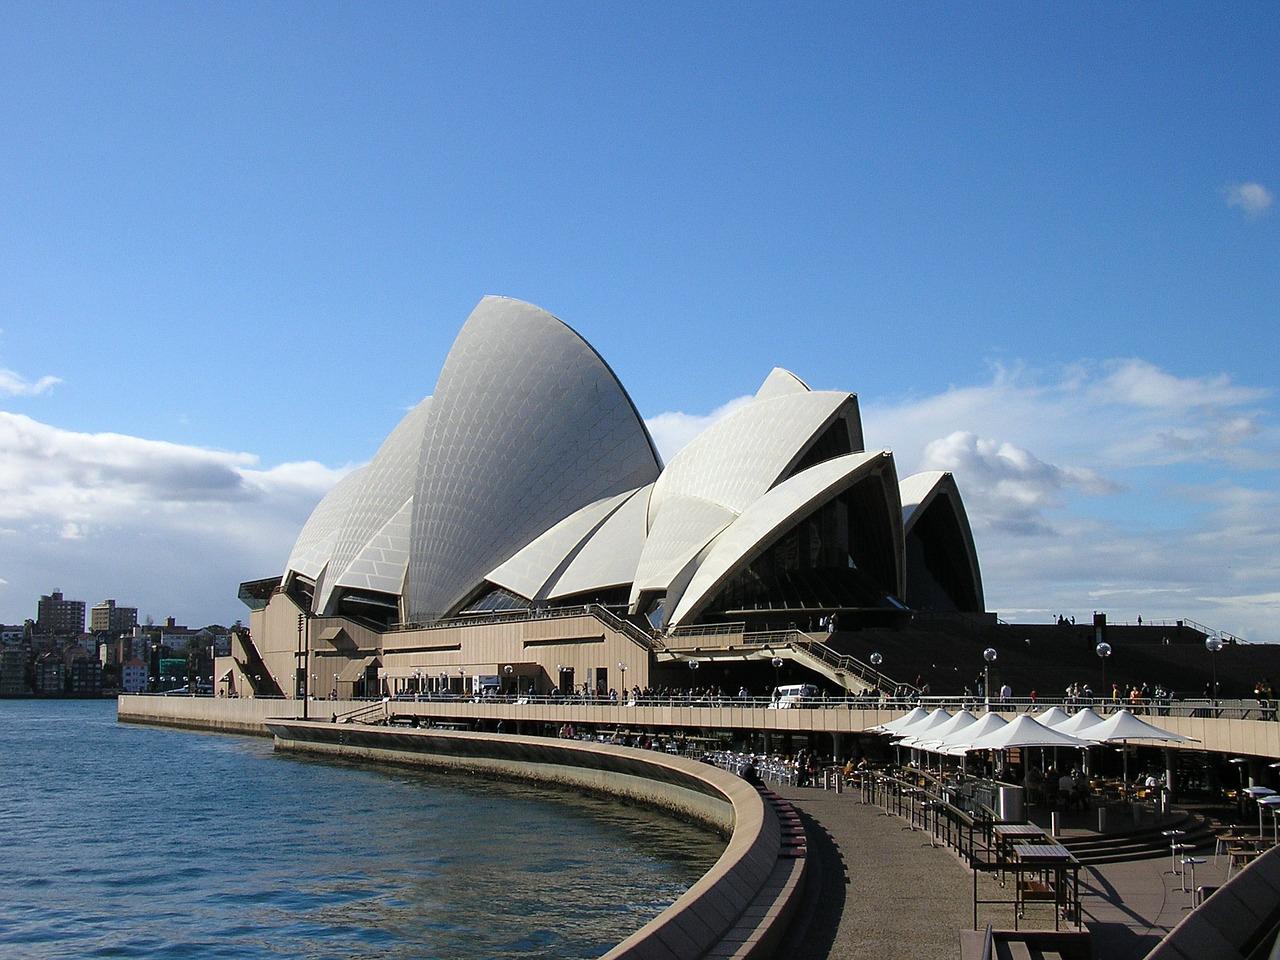 sydney-opera-house-1223405_1280.jpg